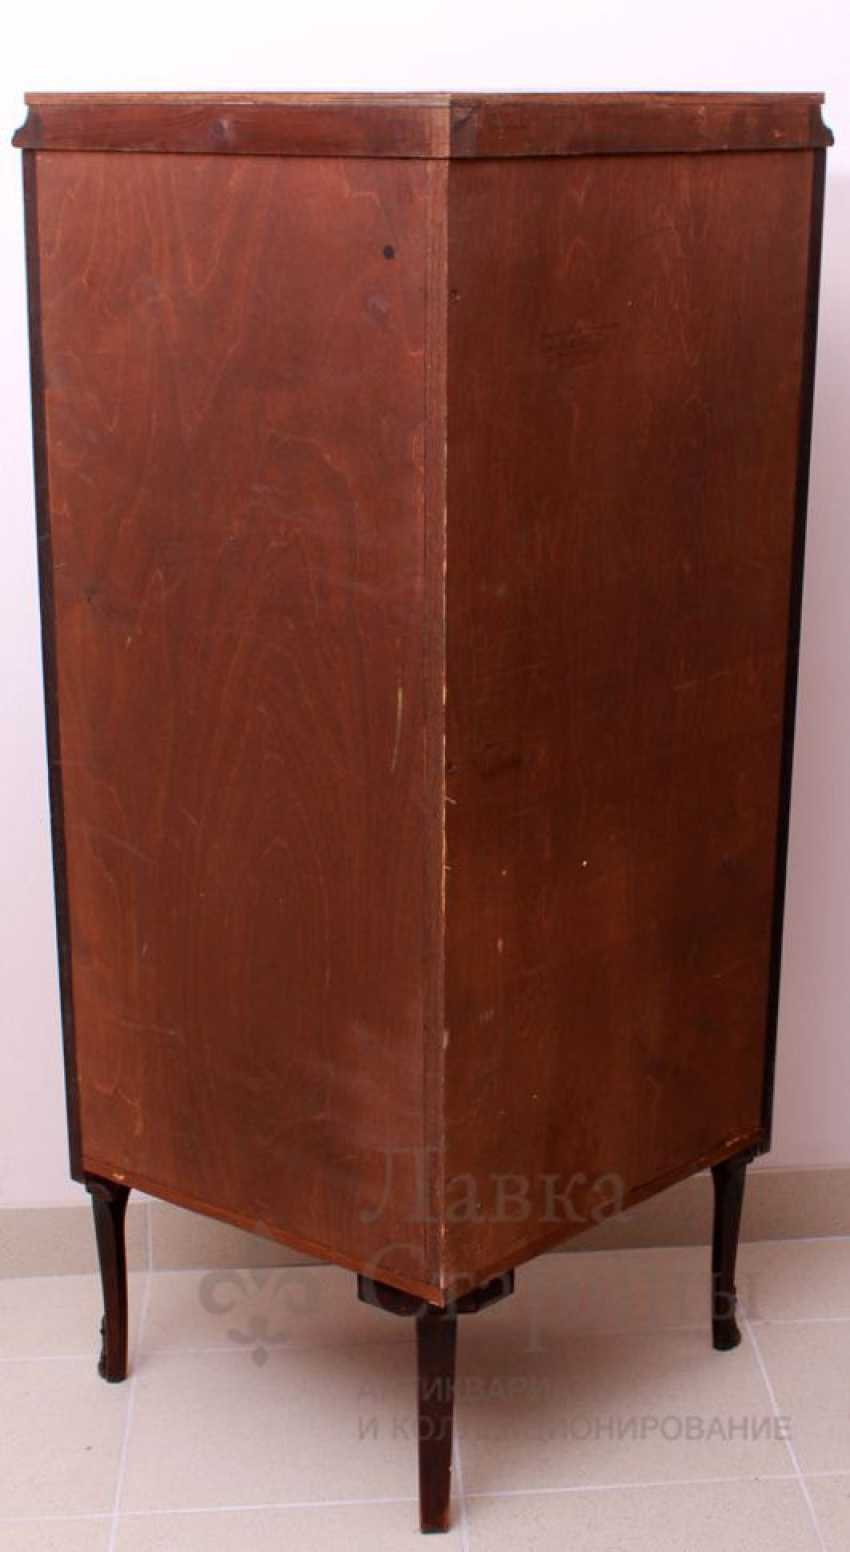 Showcase c, stacked pattern, mahogany, marquetry - photo 7